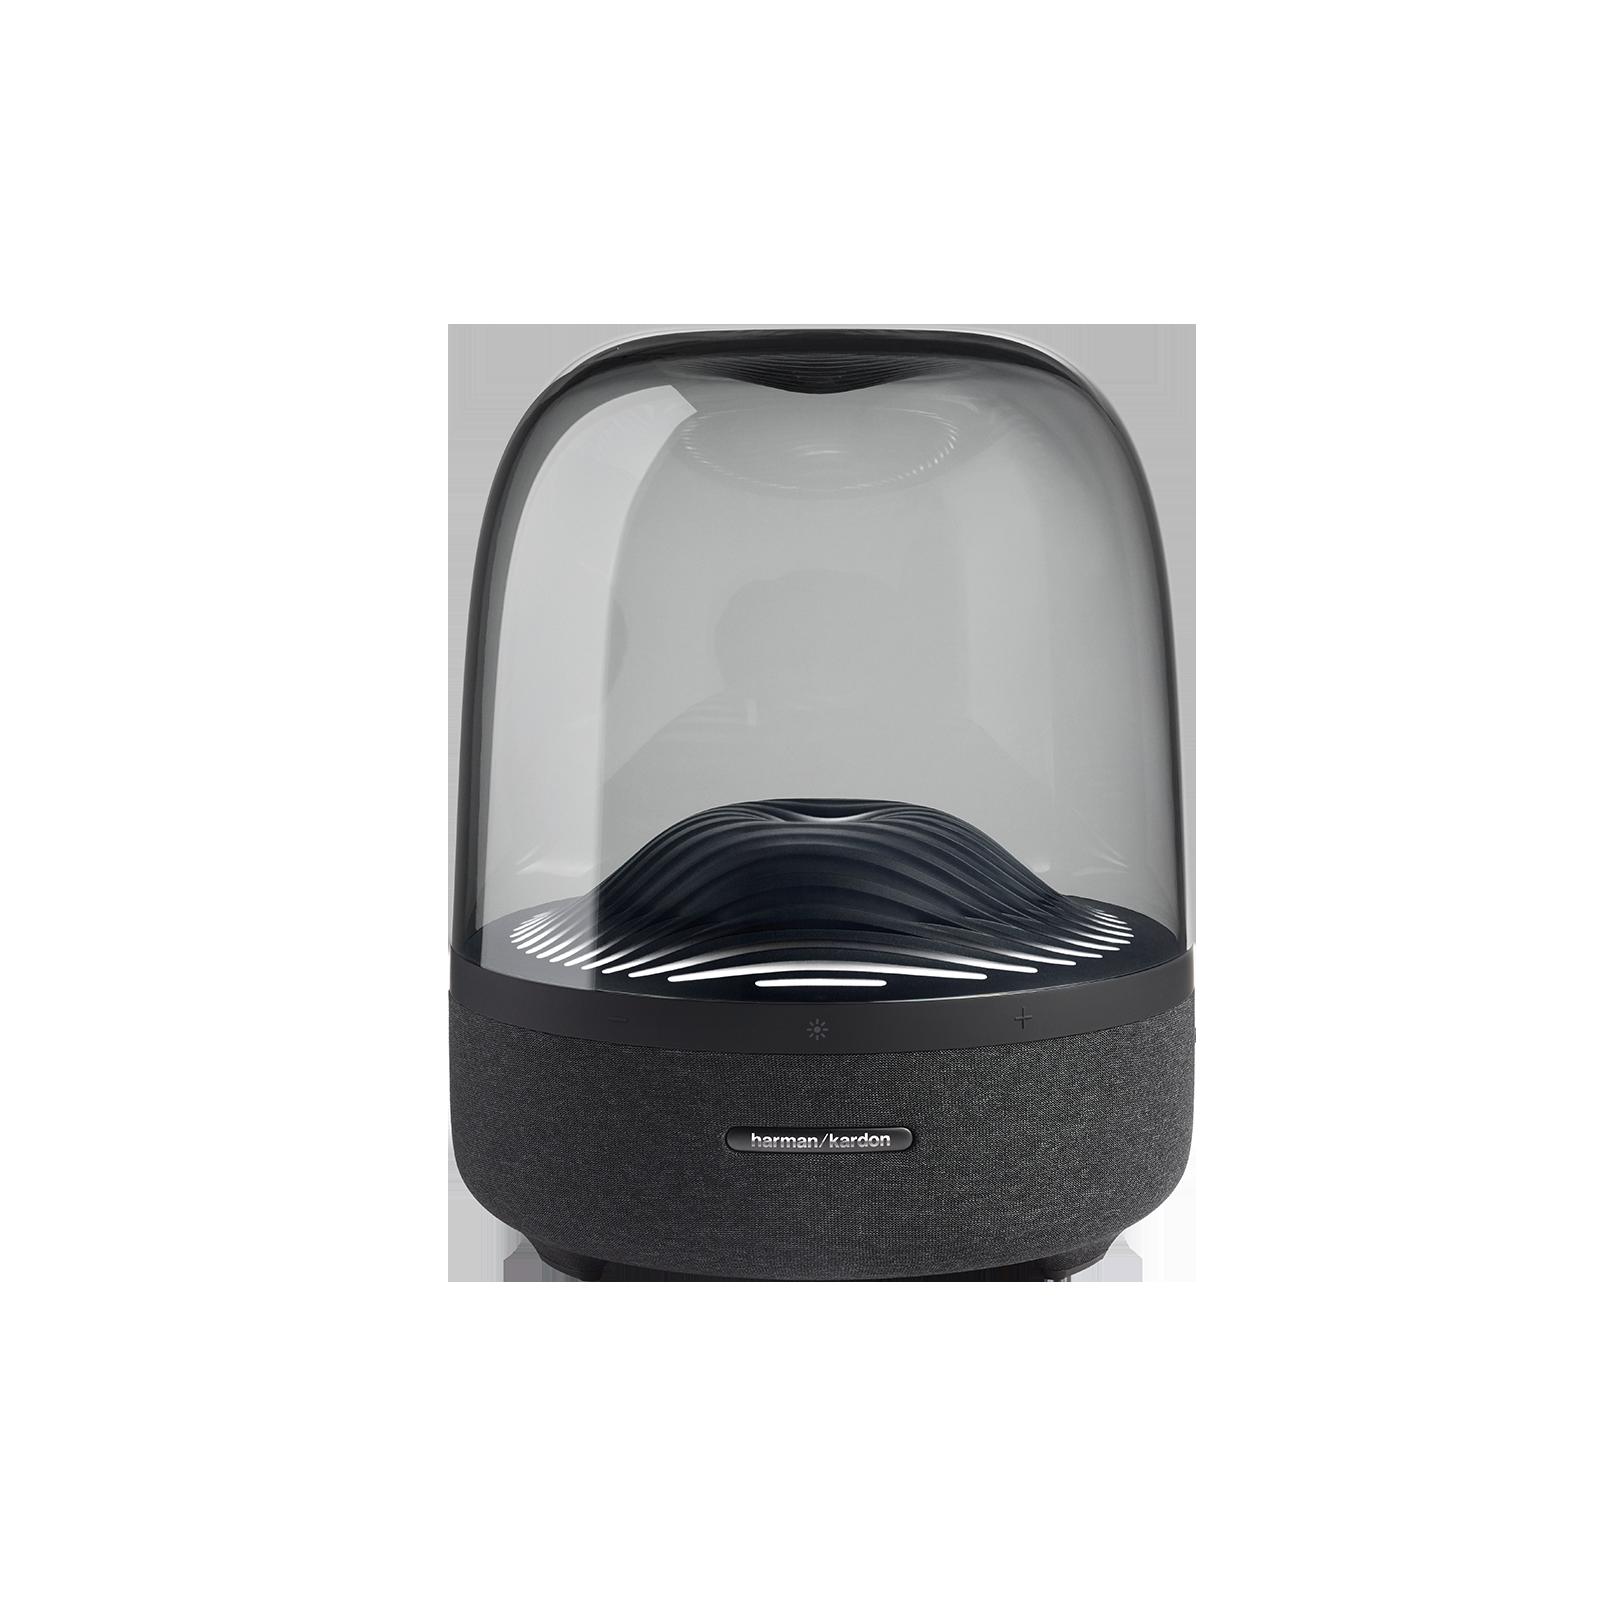 Aura Studio 3 - Black - Bluetooth speaker - Hero